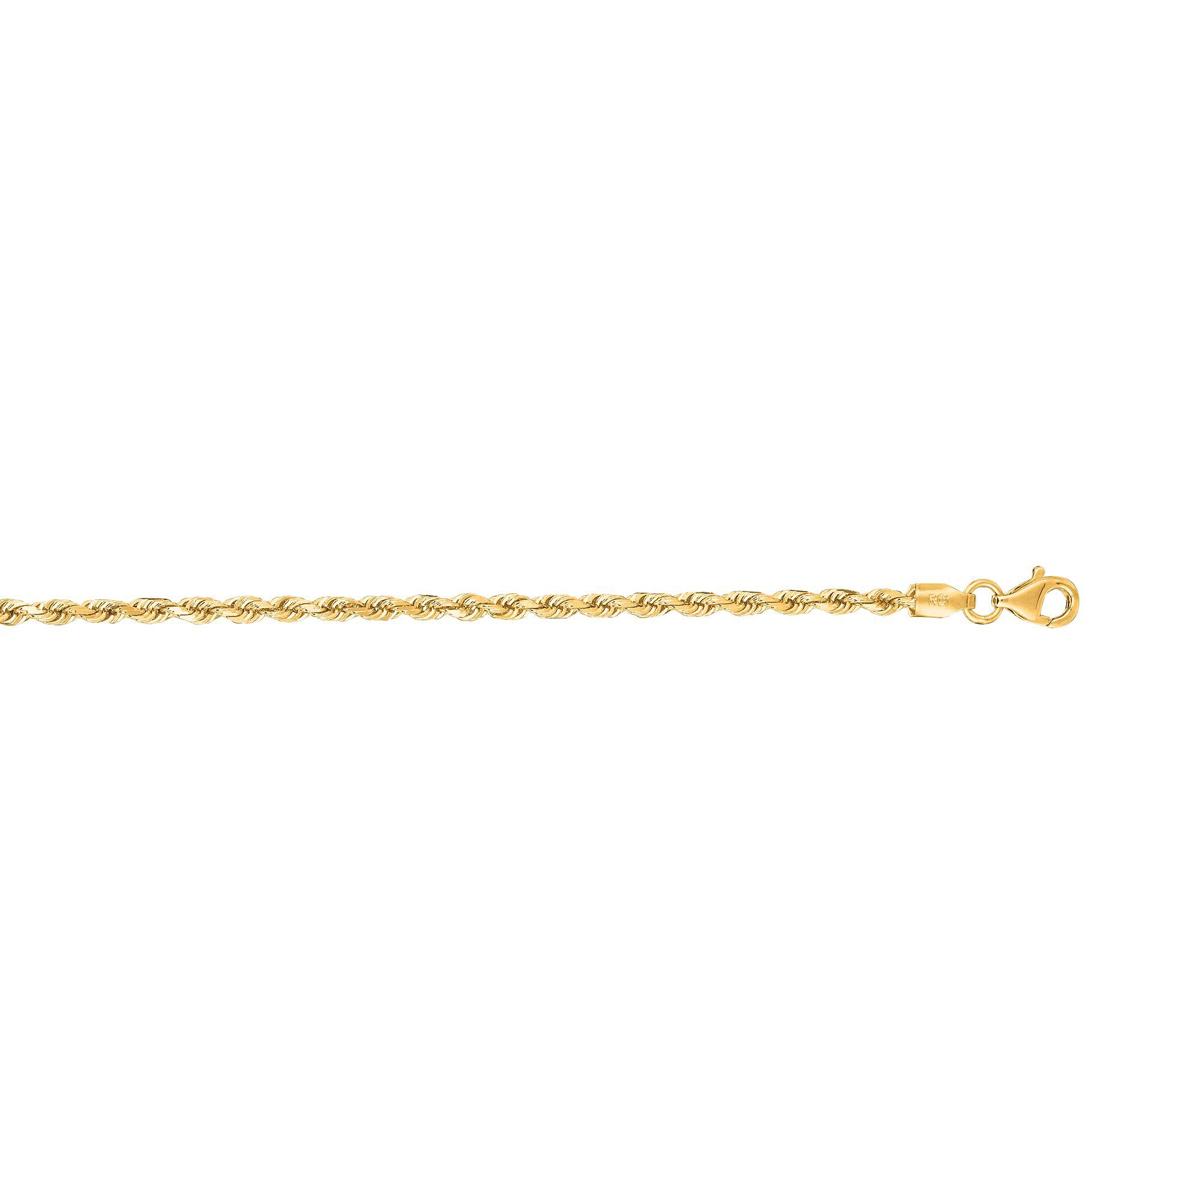 Royal Chain 14 Karat Yellow Gold 2.5mm Diamond Cut Rope Chain